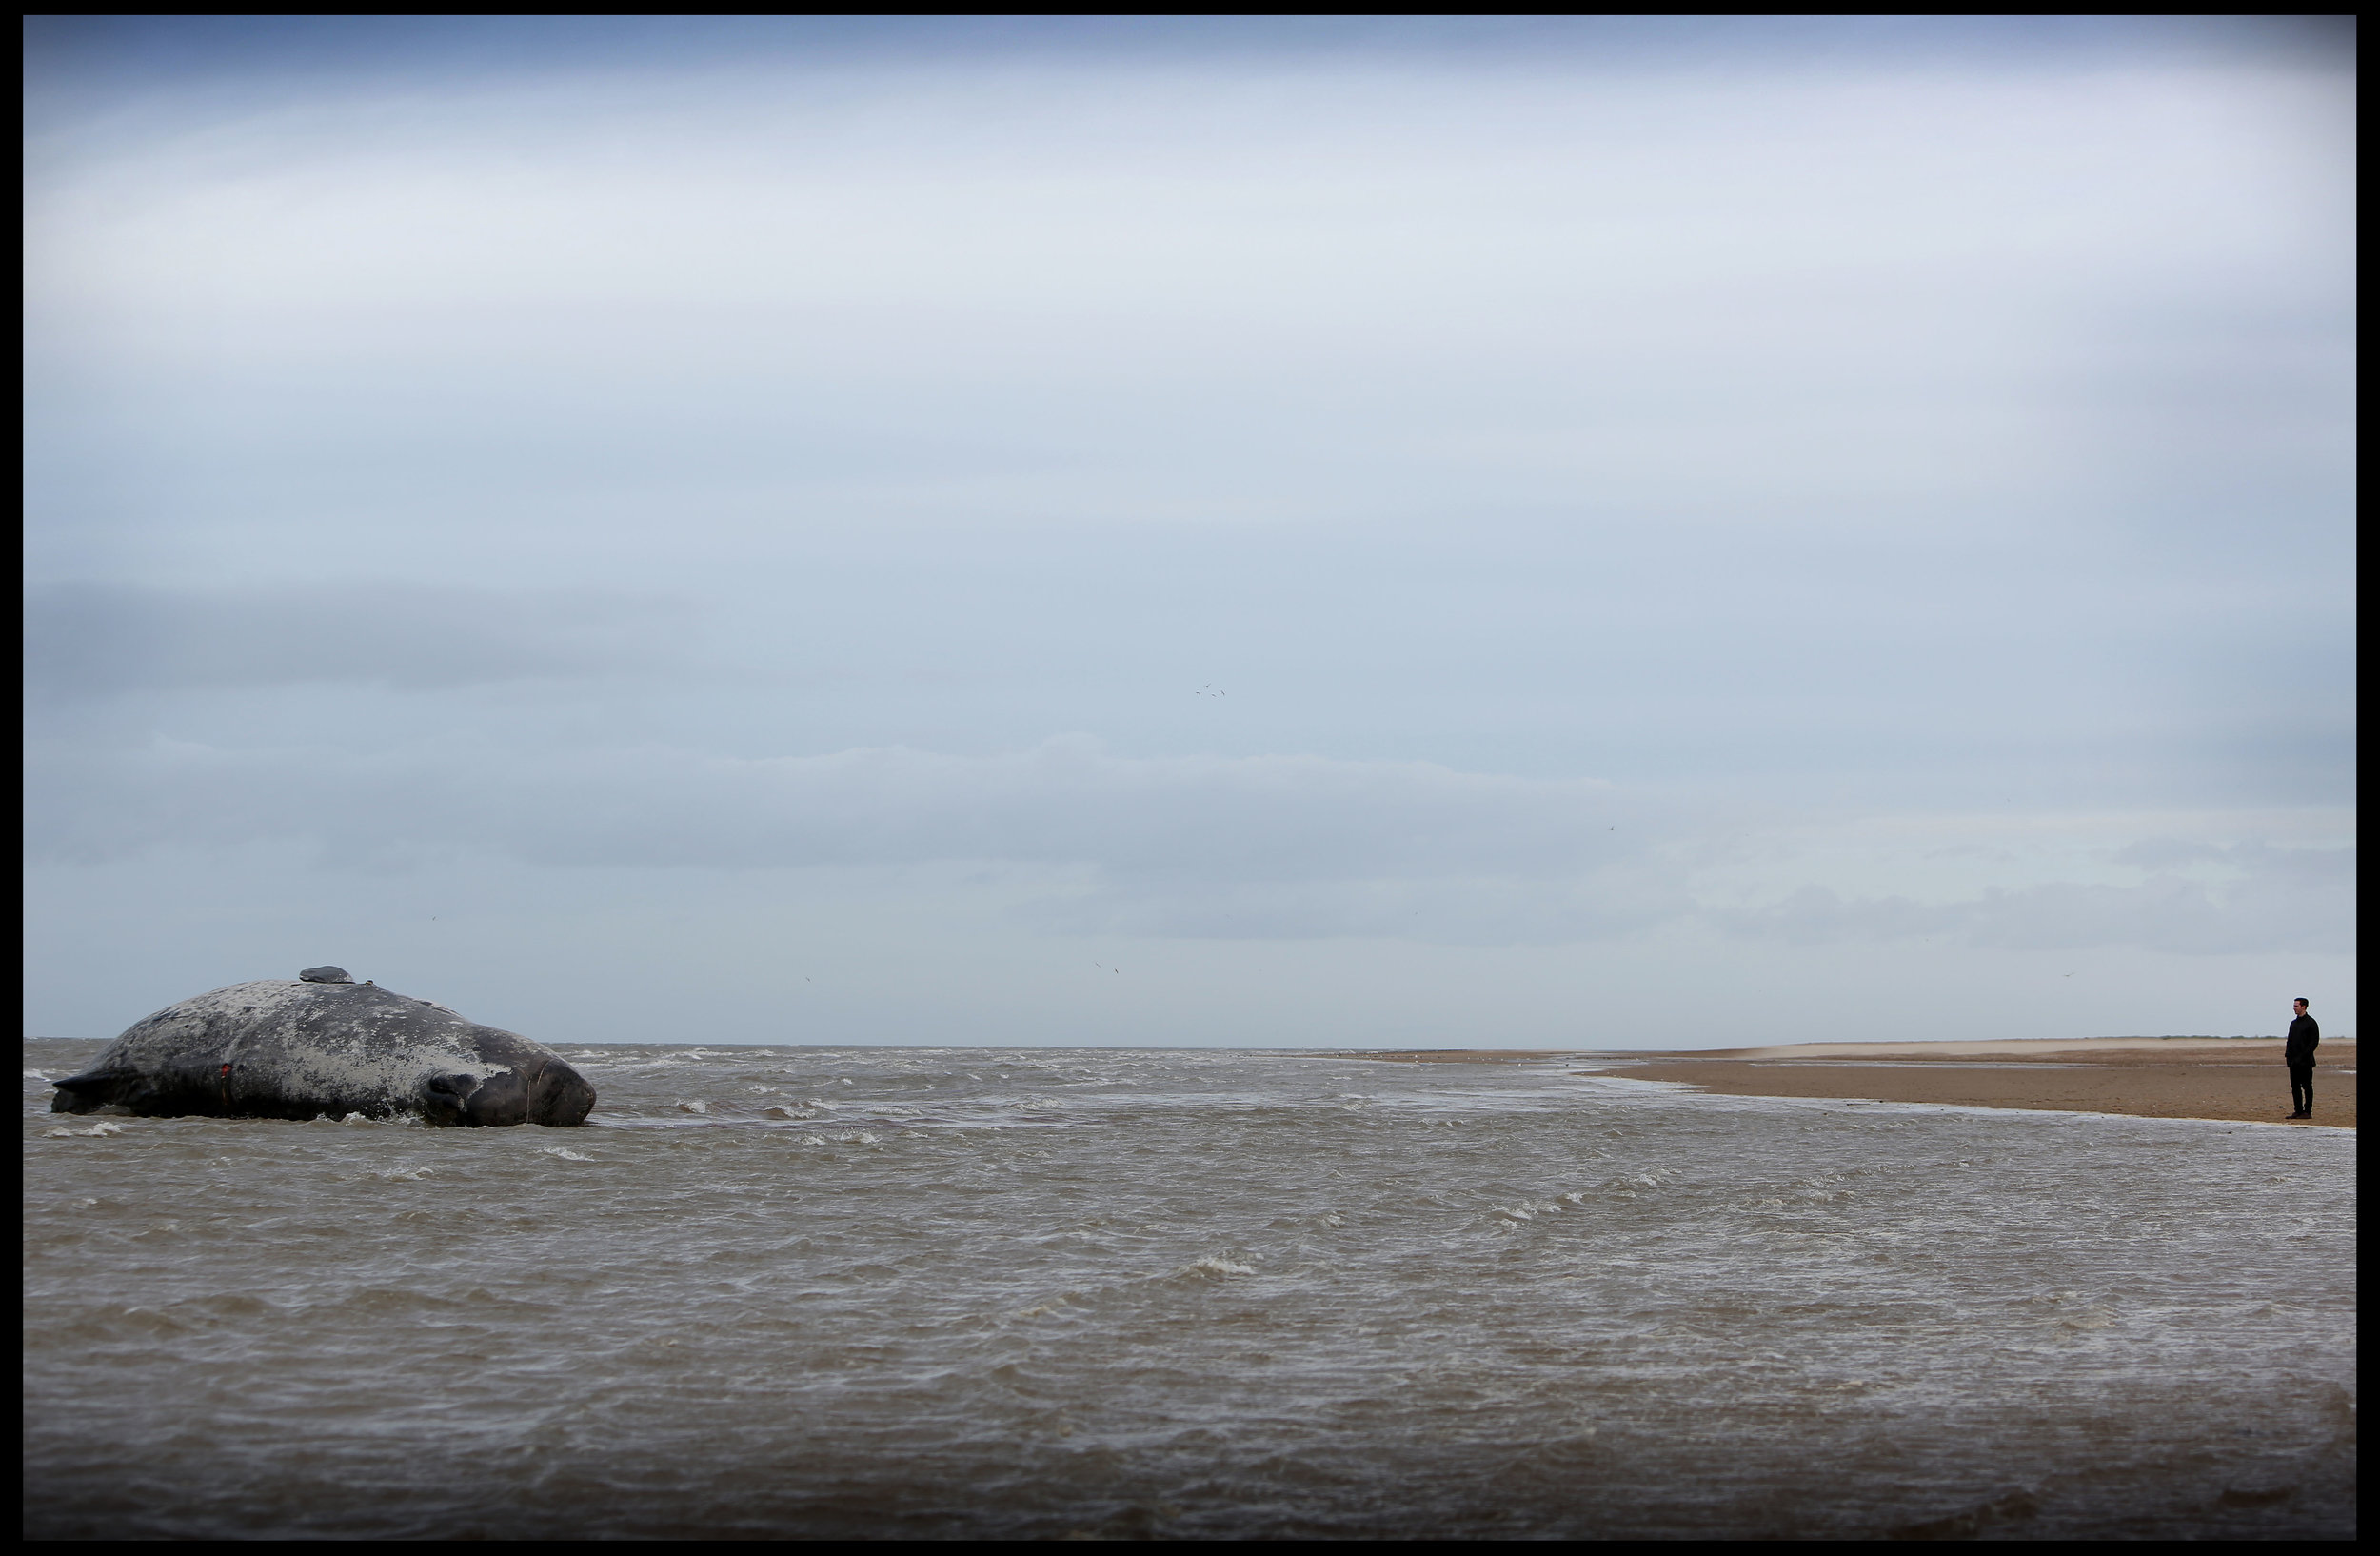 Beached sperm whale, Old Hunstanton, Norfolk